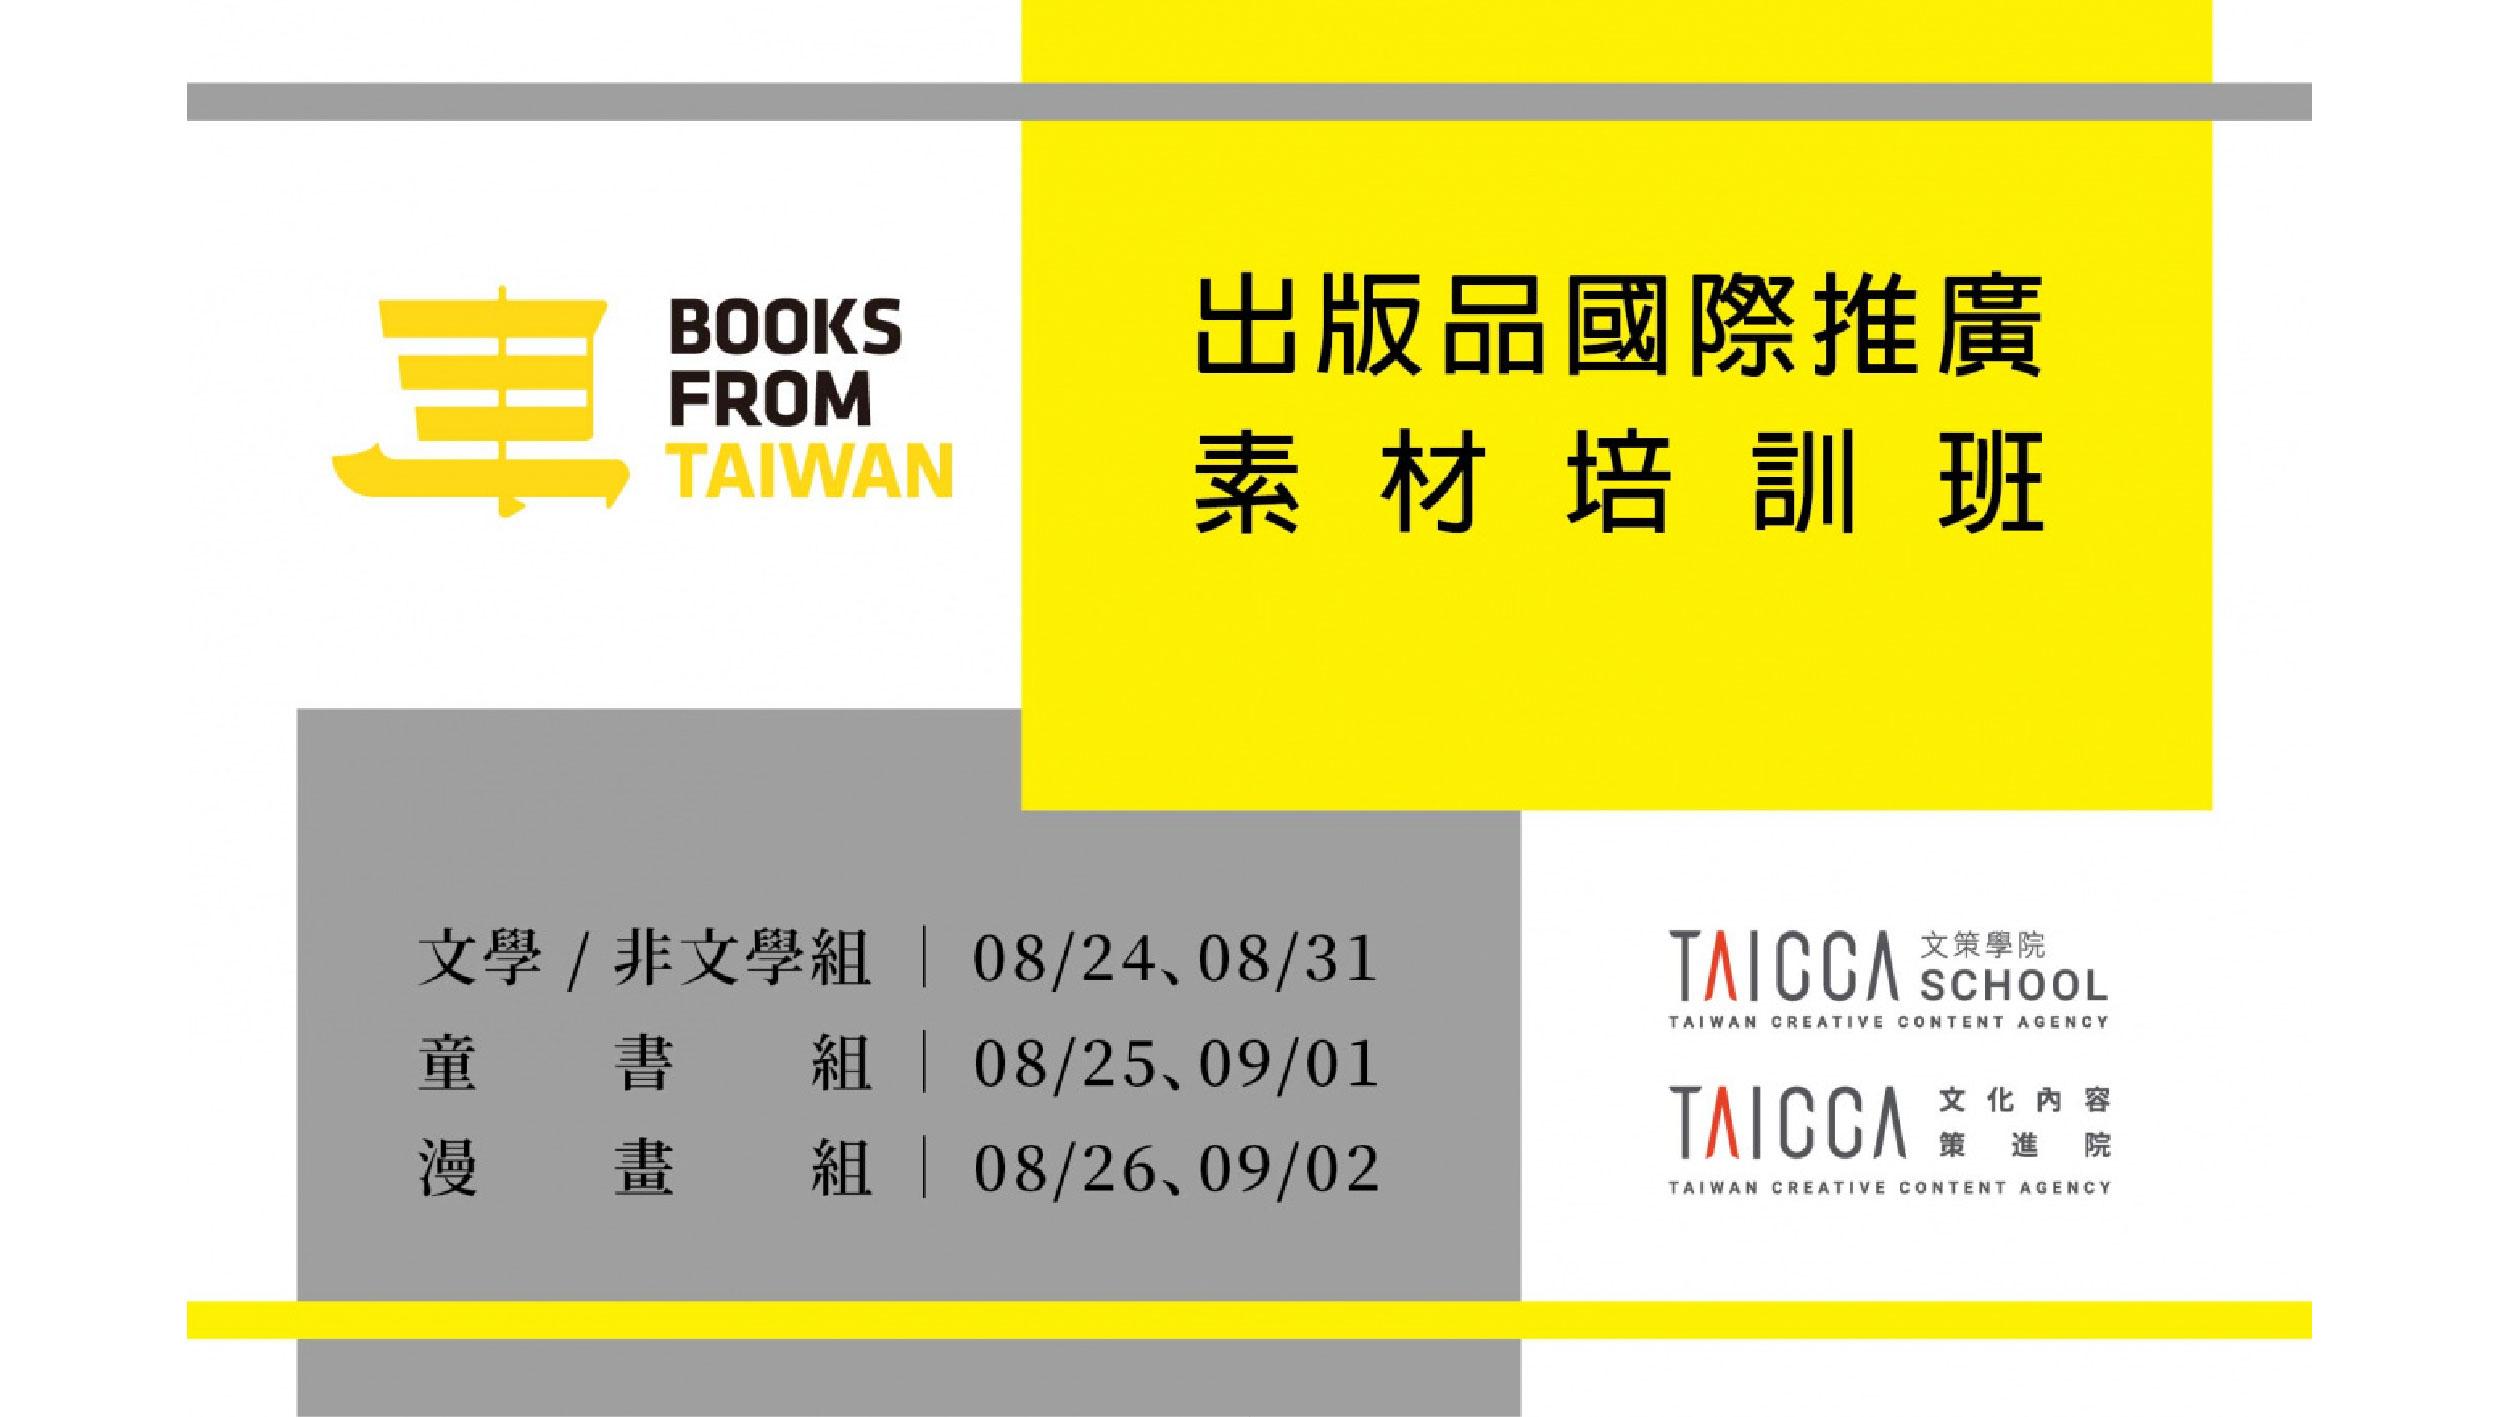 2021 Books from Taiwan 出版品國際推廣素材培訓班